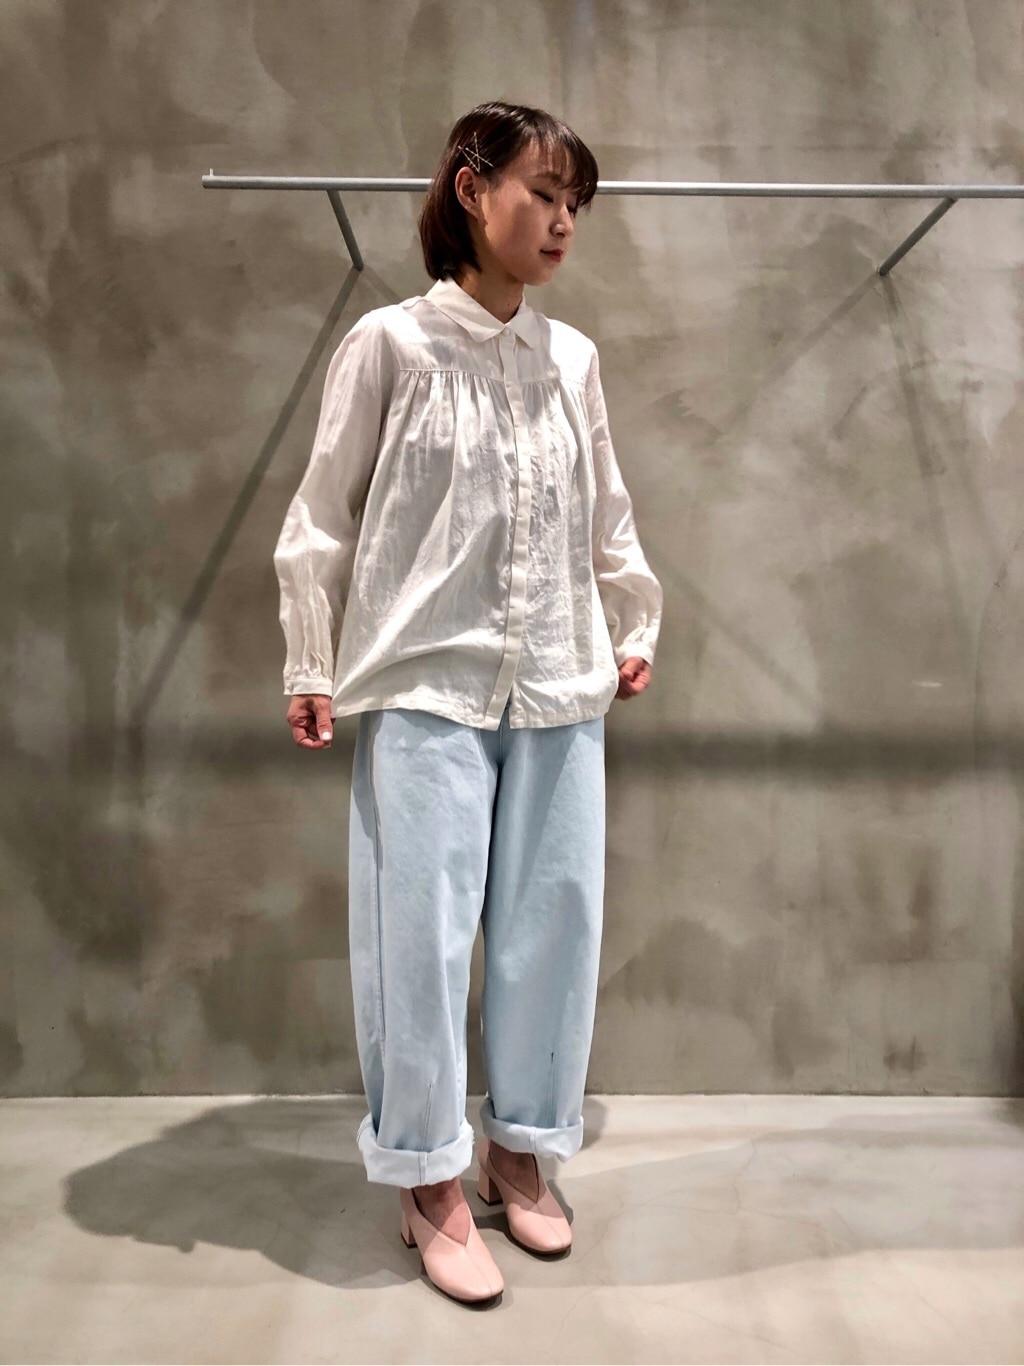 bulle de savon 渋谷スクランブルスクエア 身長:159cm 2020.03.04